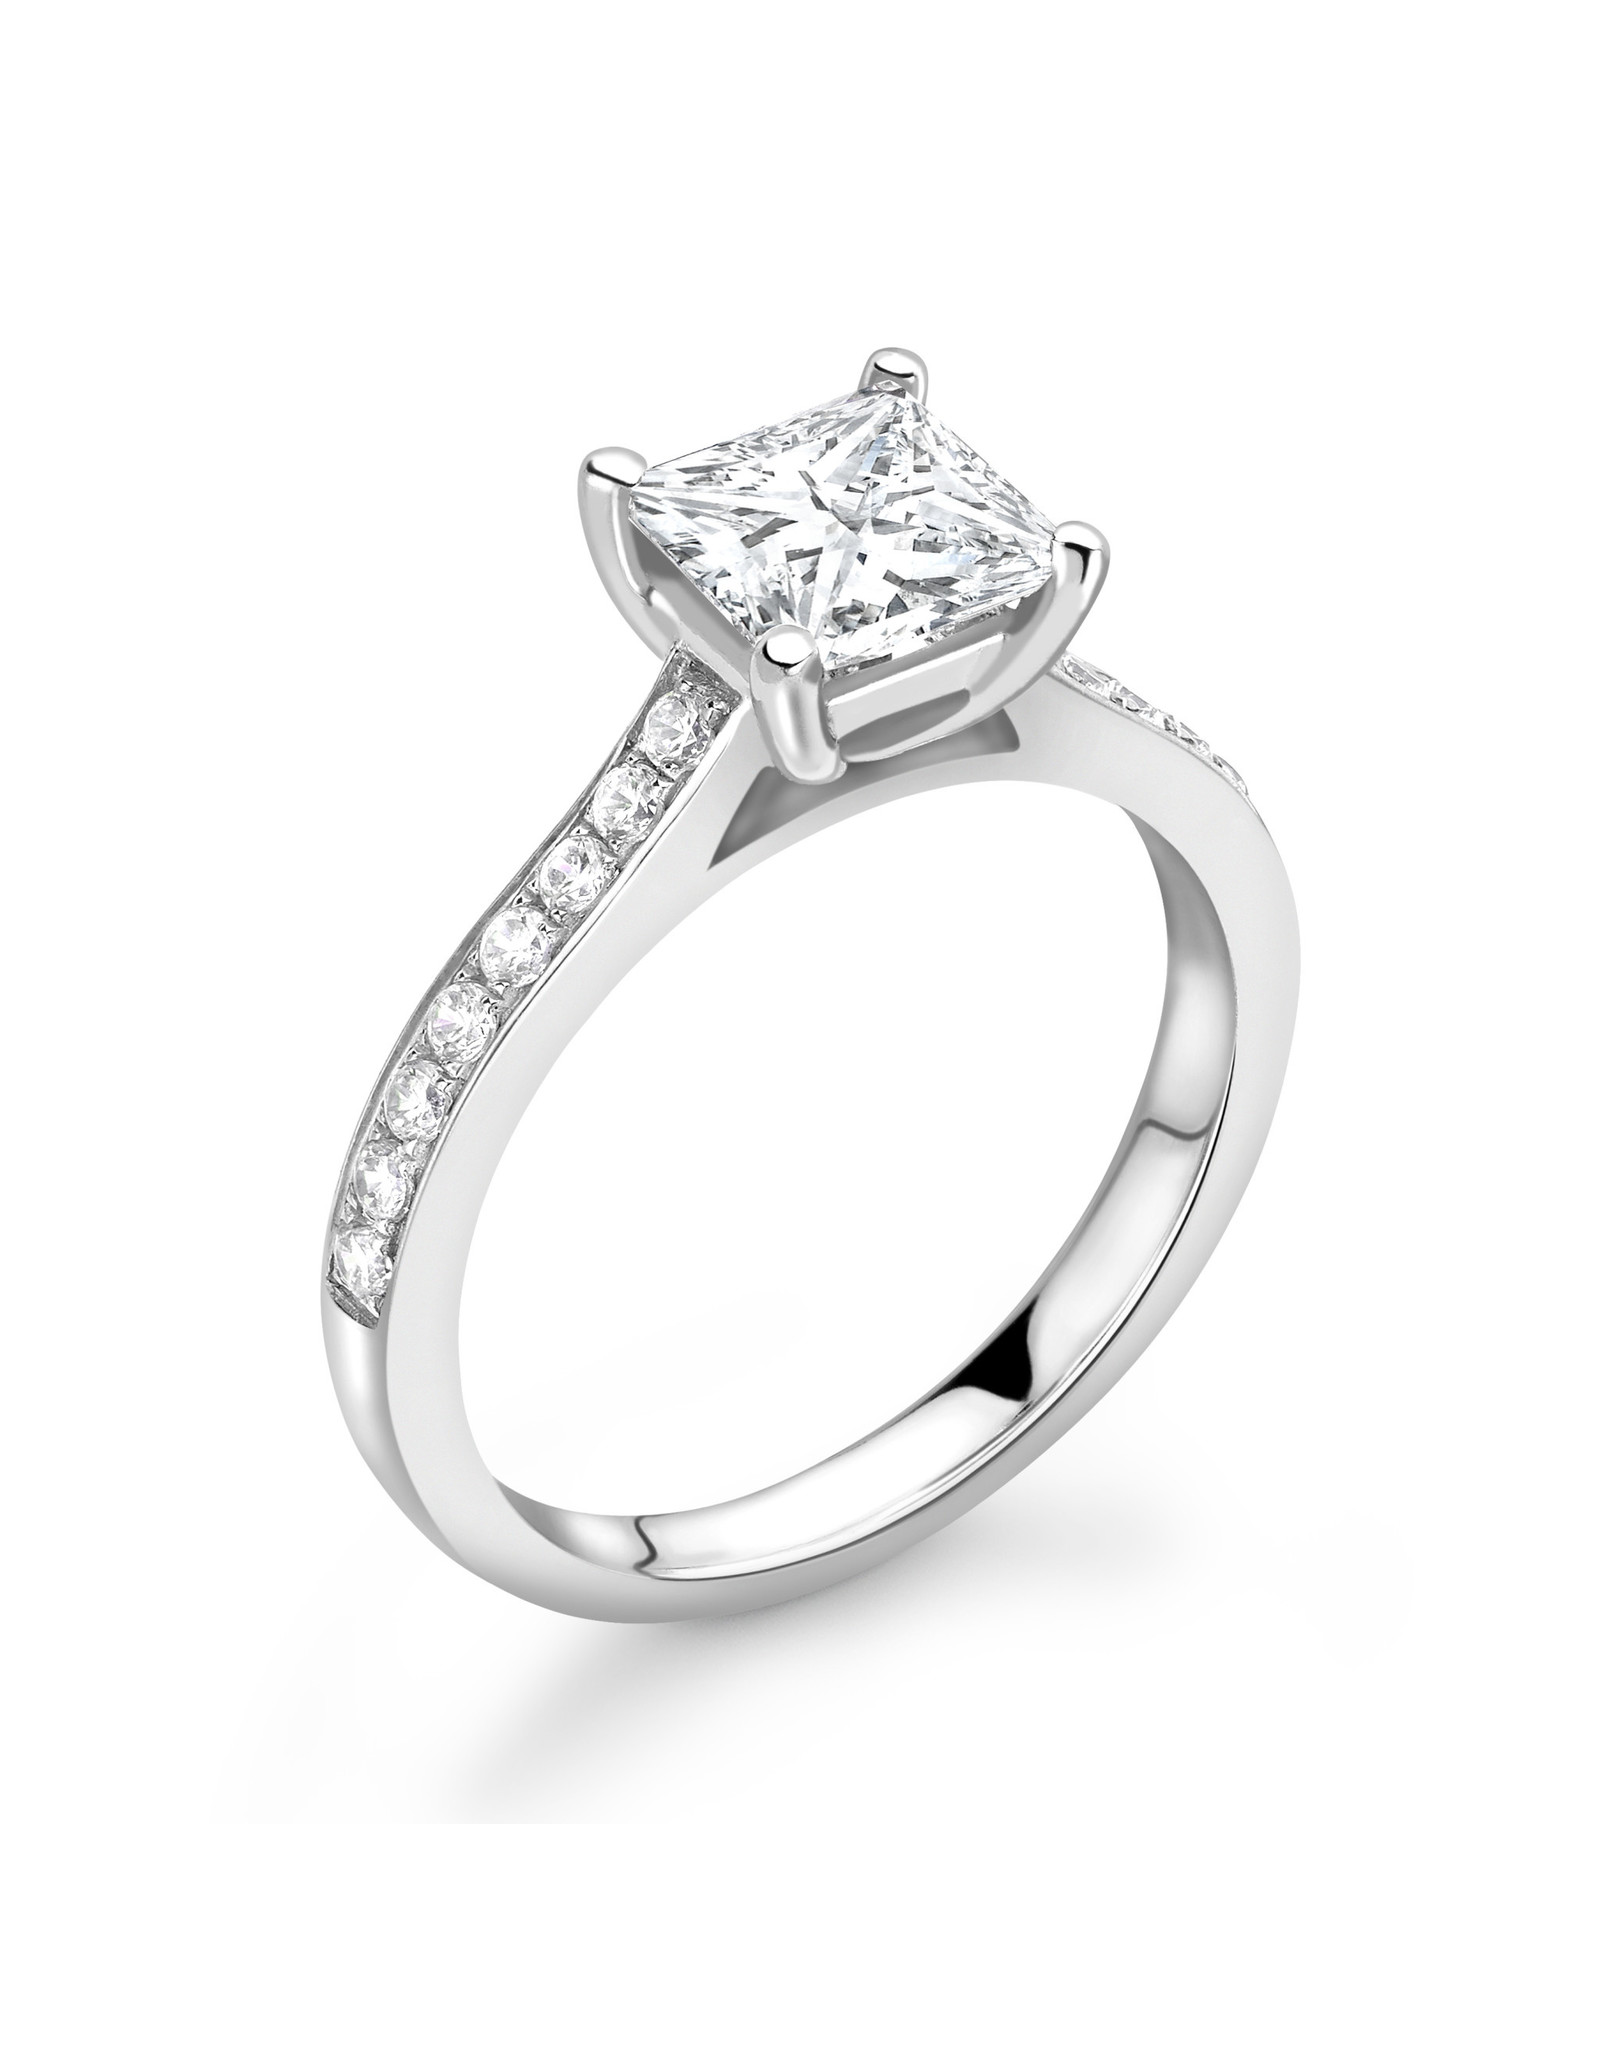 LVN Princesse Verlovingsring Met Zijsteentjes LVNRX6688